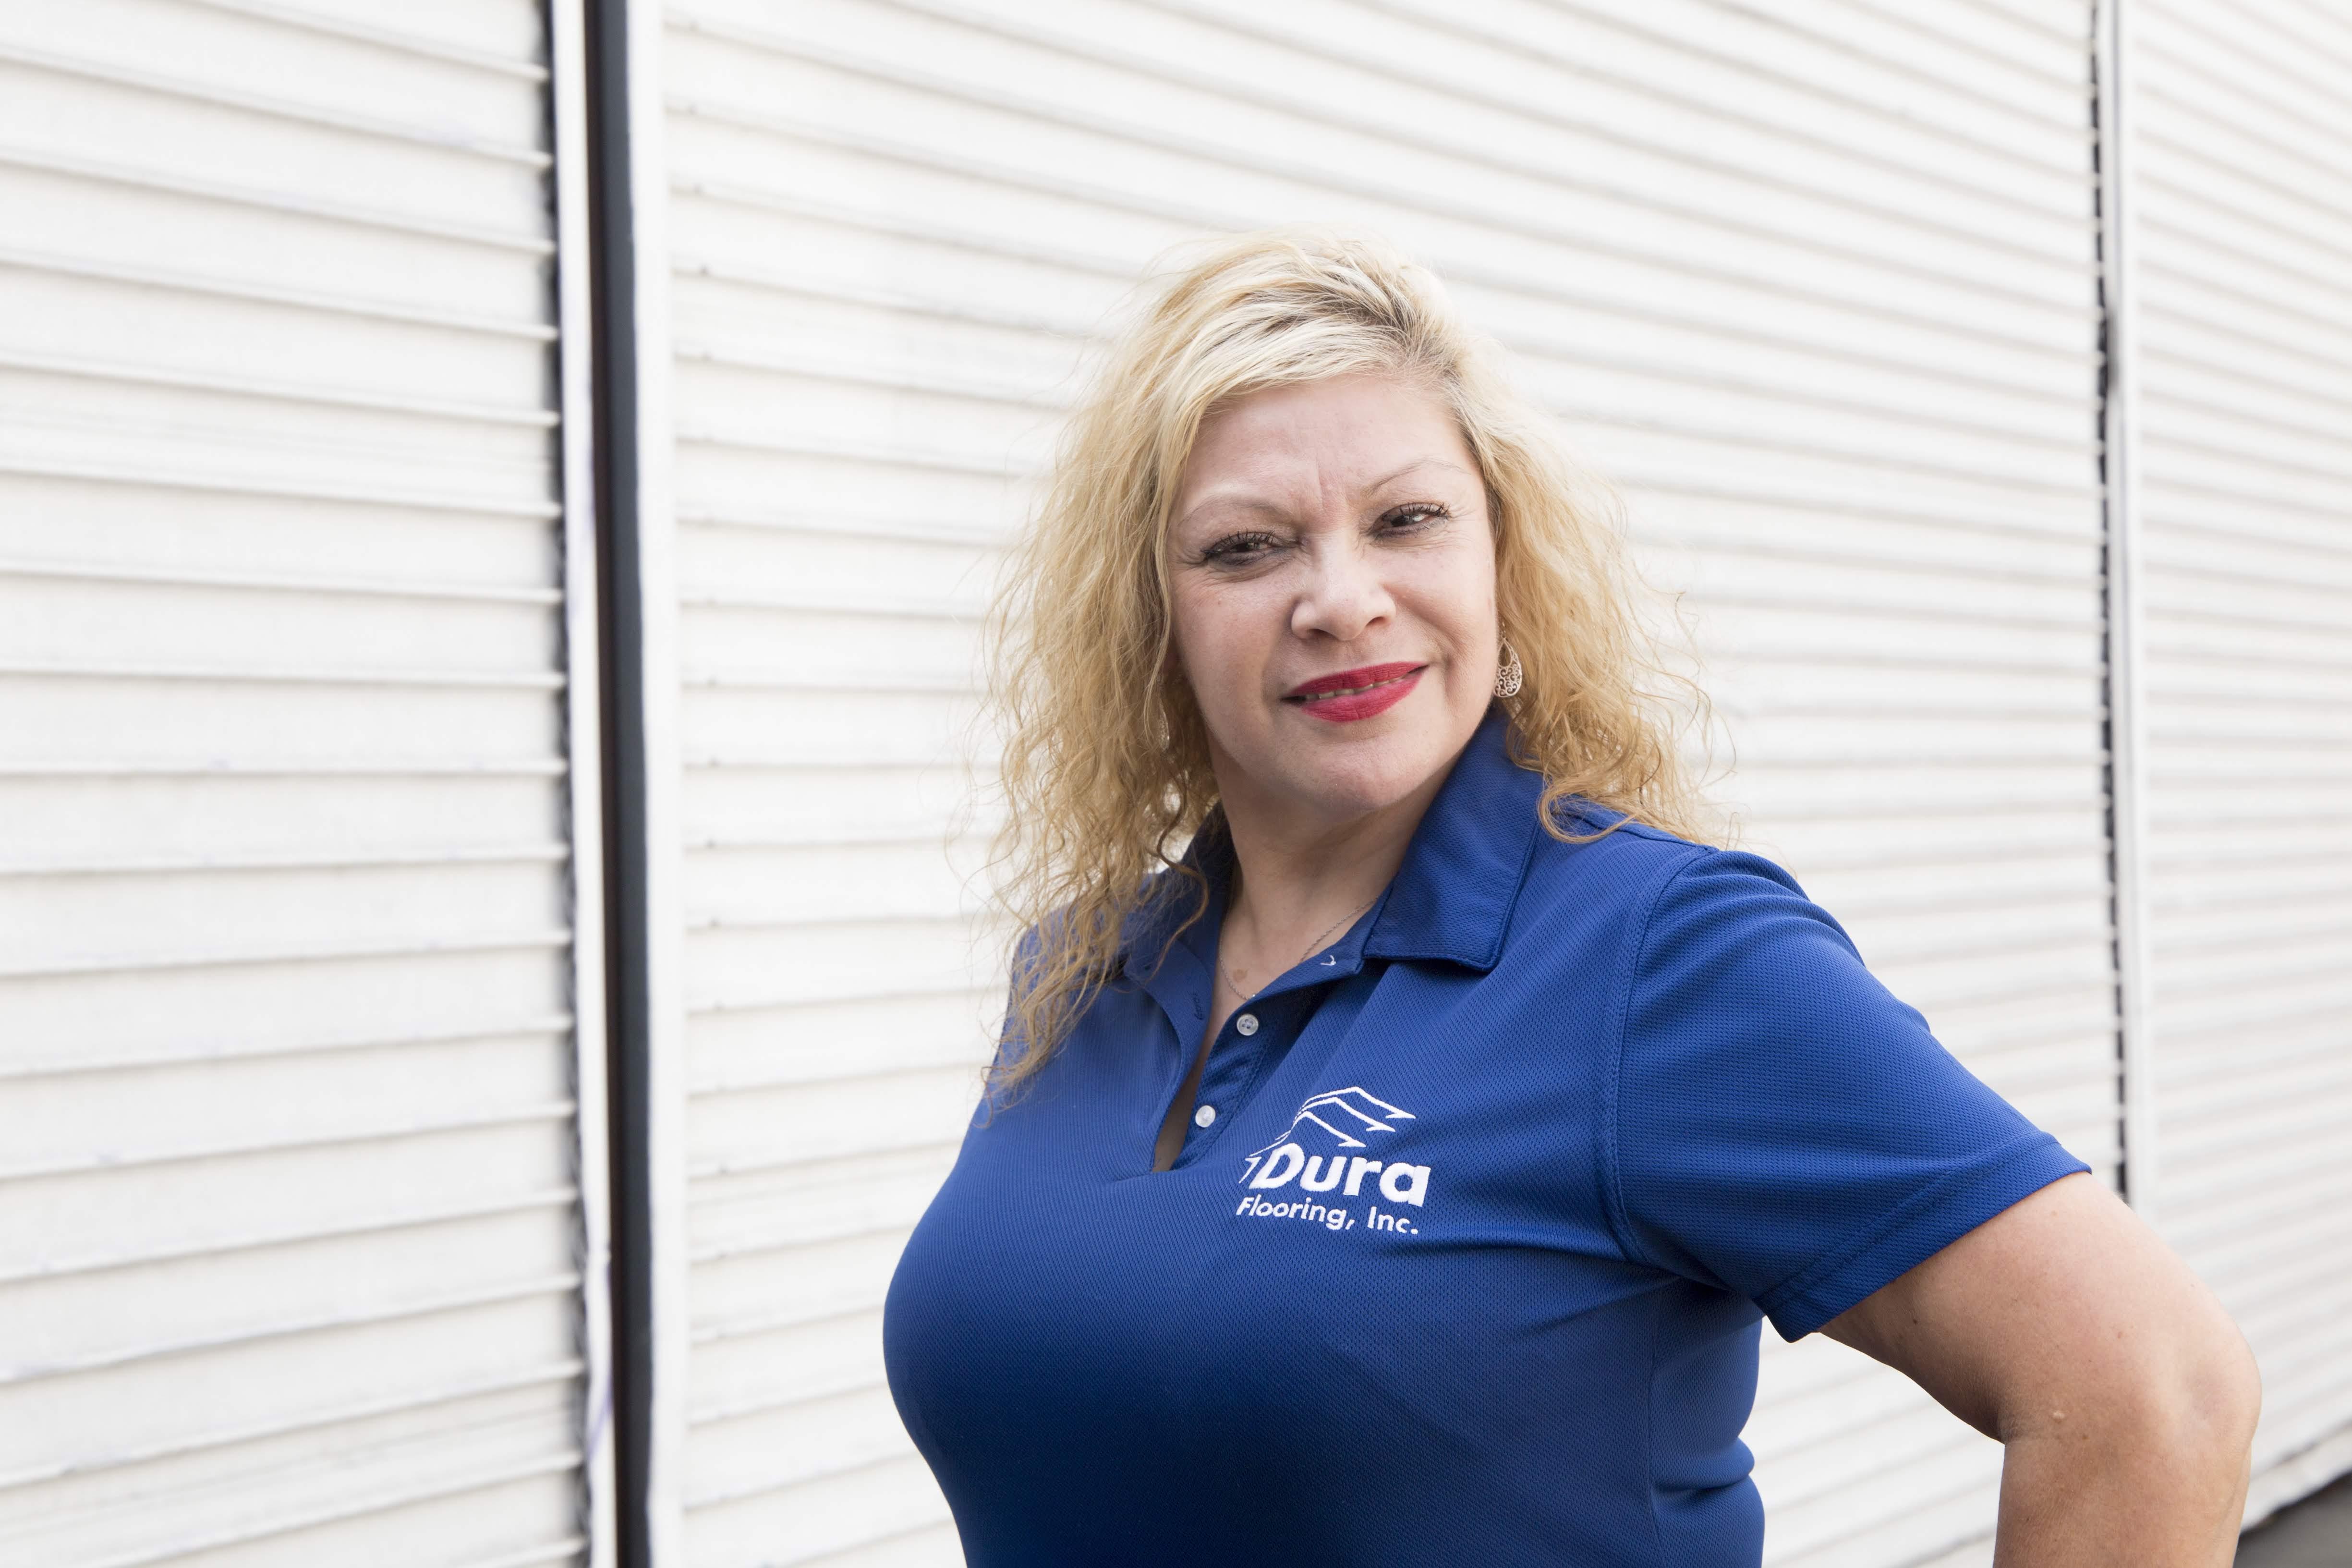 Lisa, Wholesale Rep at Dura Flooring, Inc